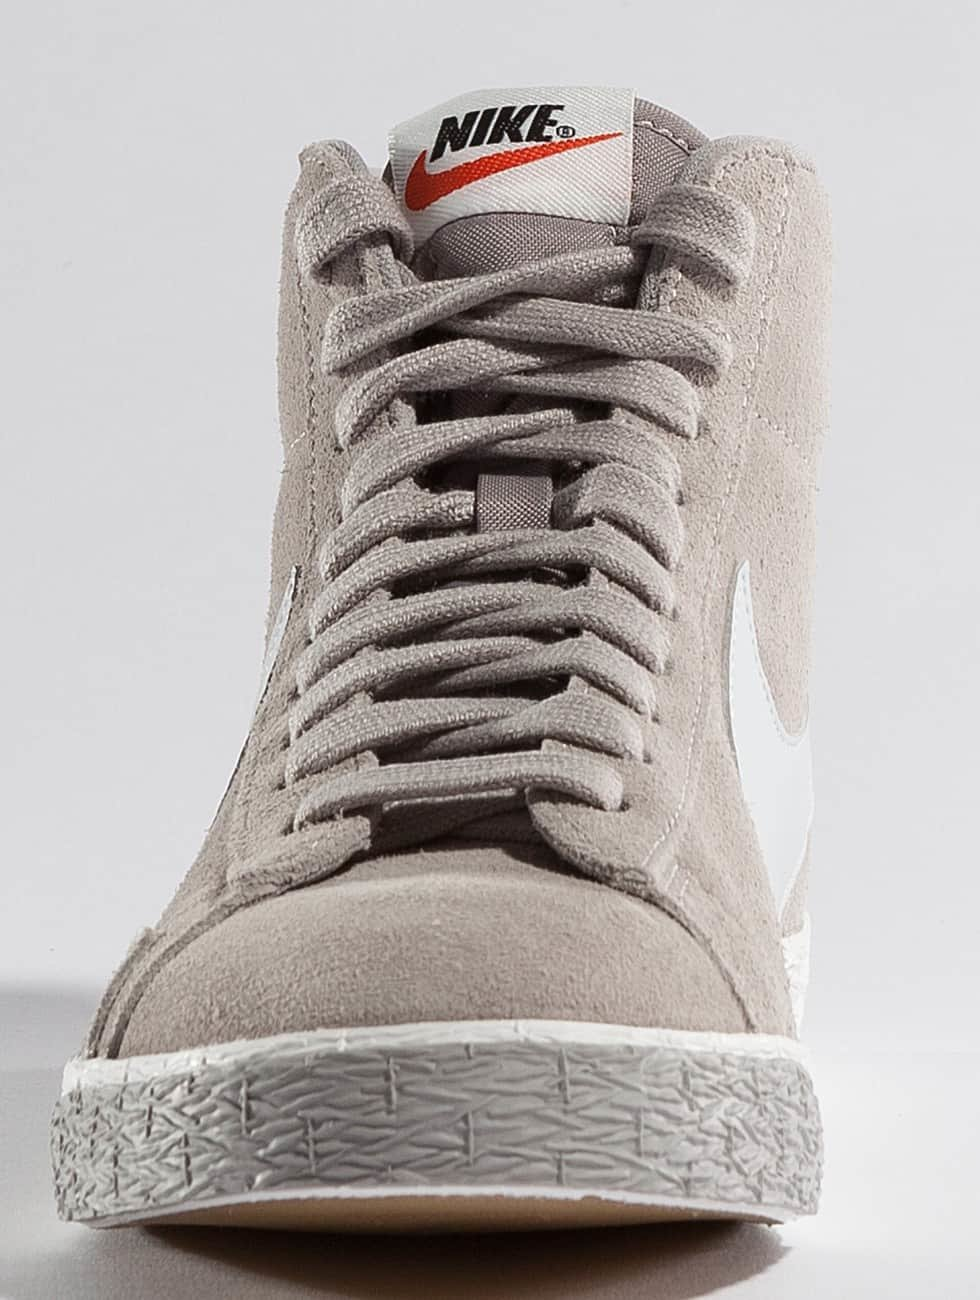 Nike Scarpa / Sneaker Blazer Mid Camoscio Grigio Vintage 335 374 1csHPUg